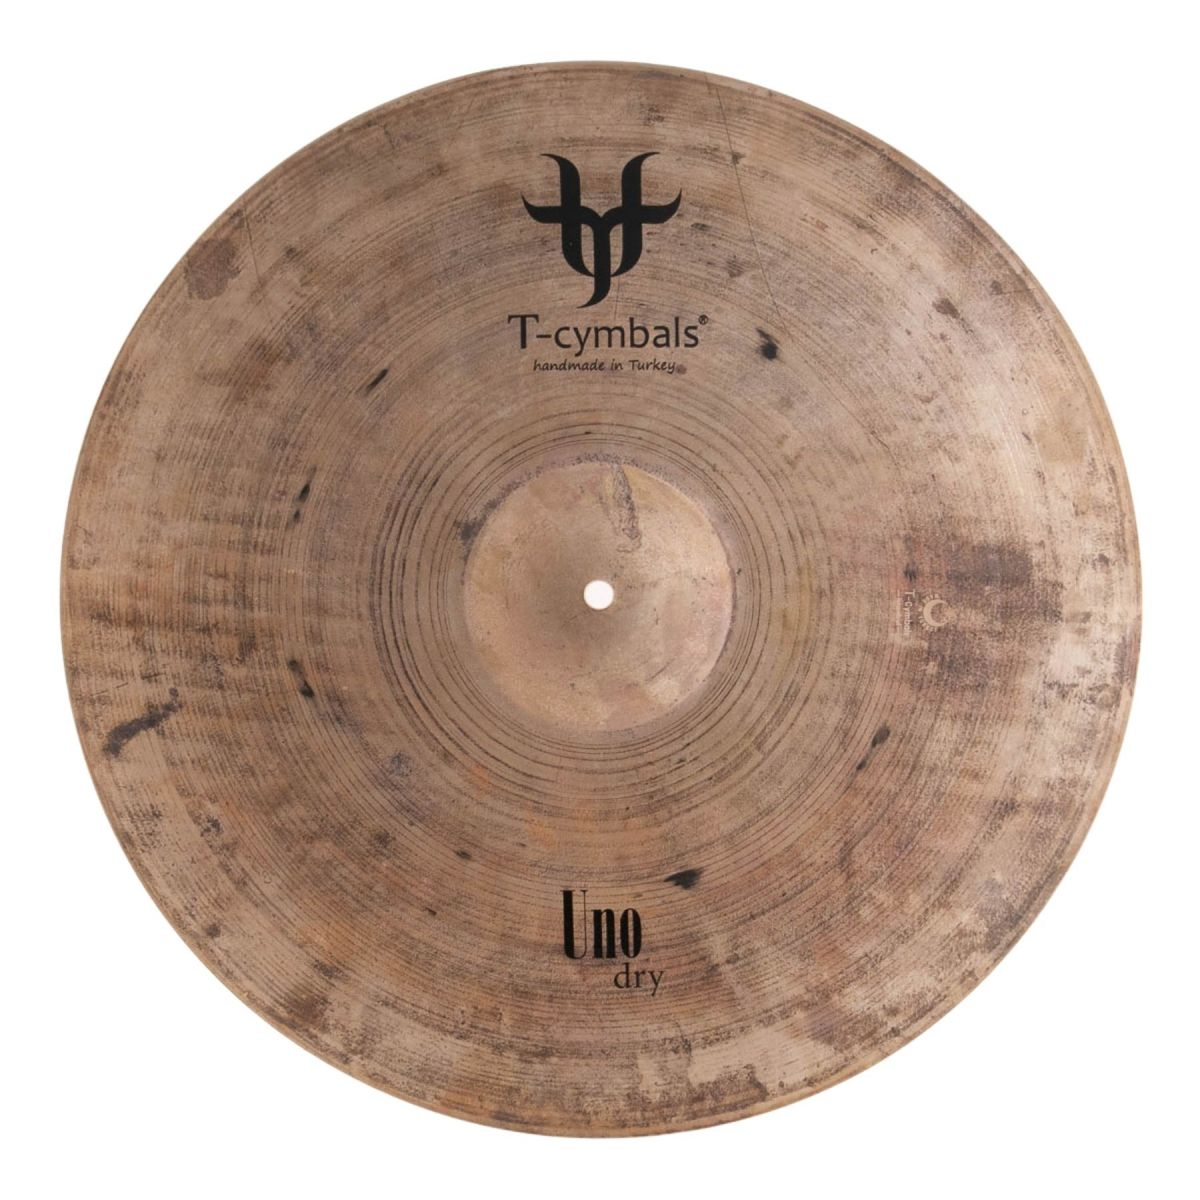 "Piatto T-Cymbals 18"" Uno Dry Crash"